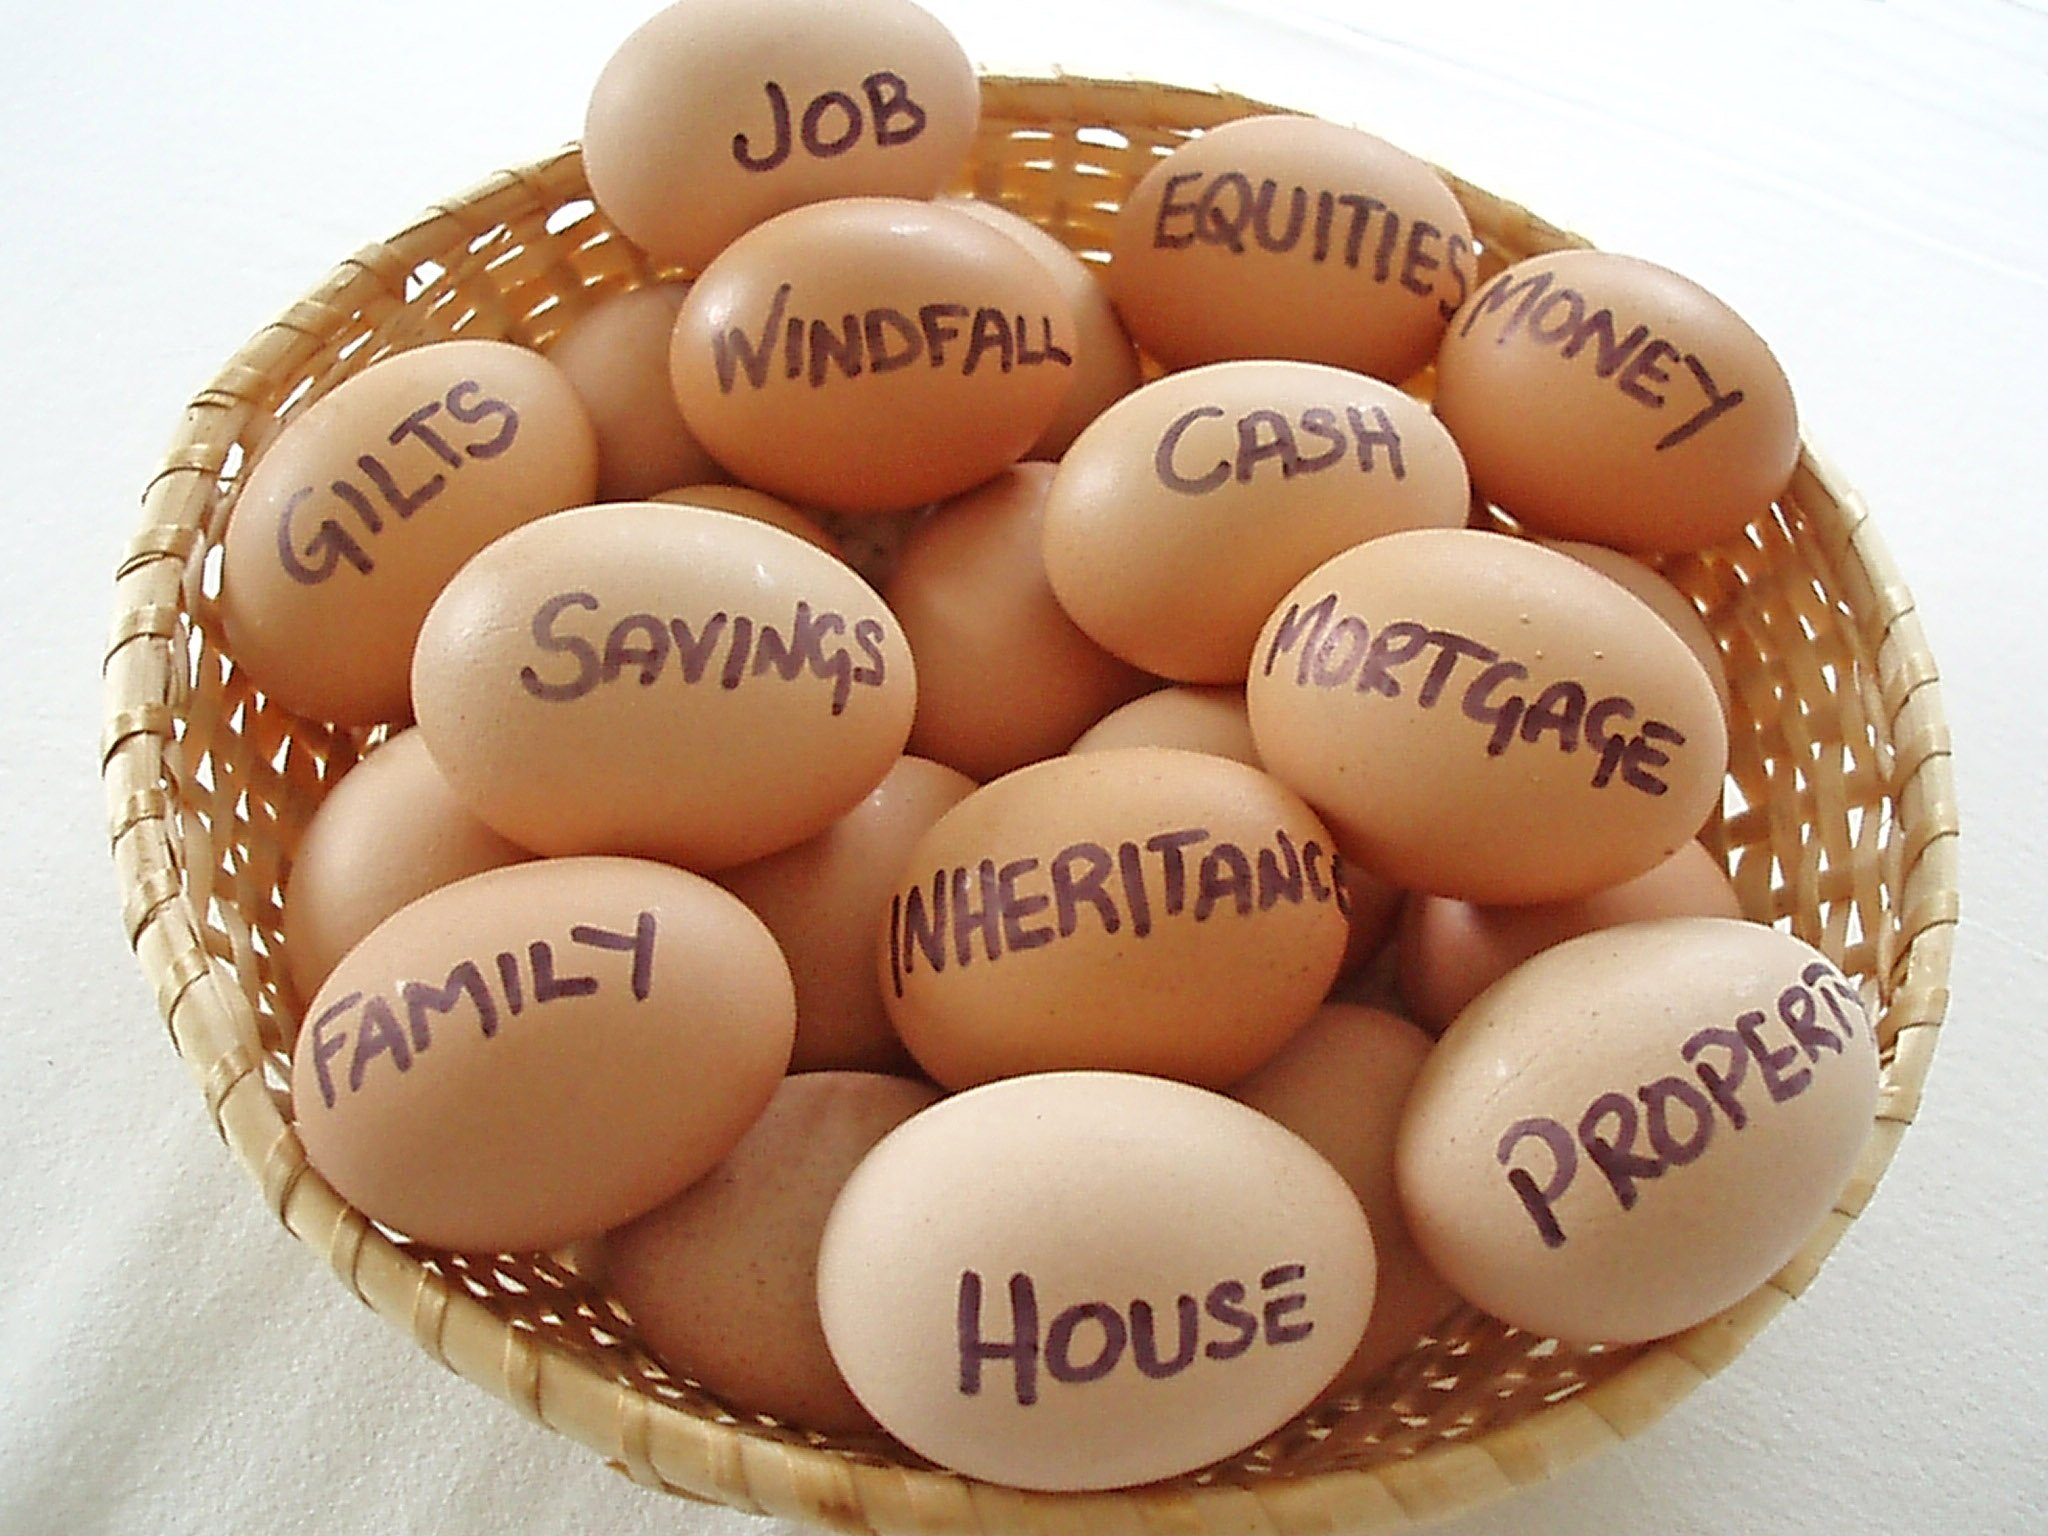 Financial planning case studies series 2